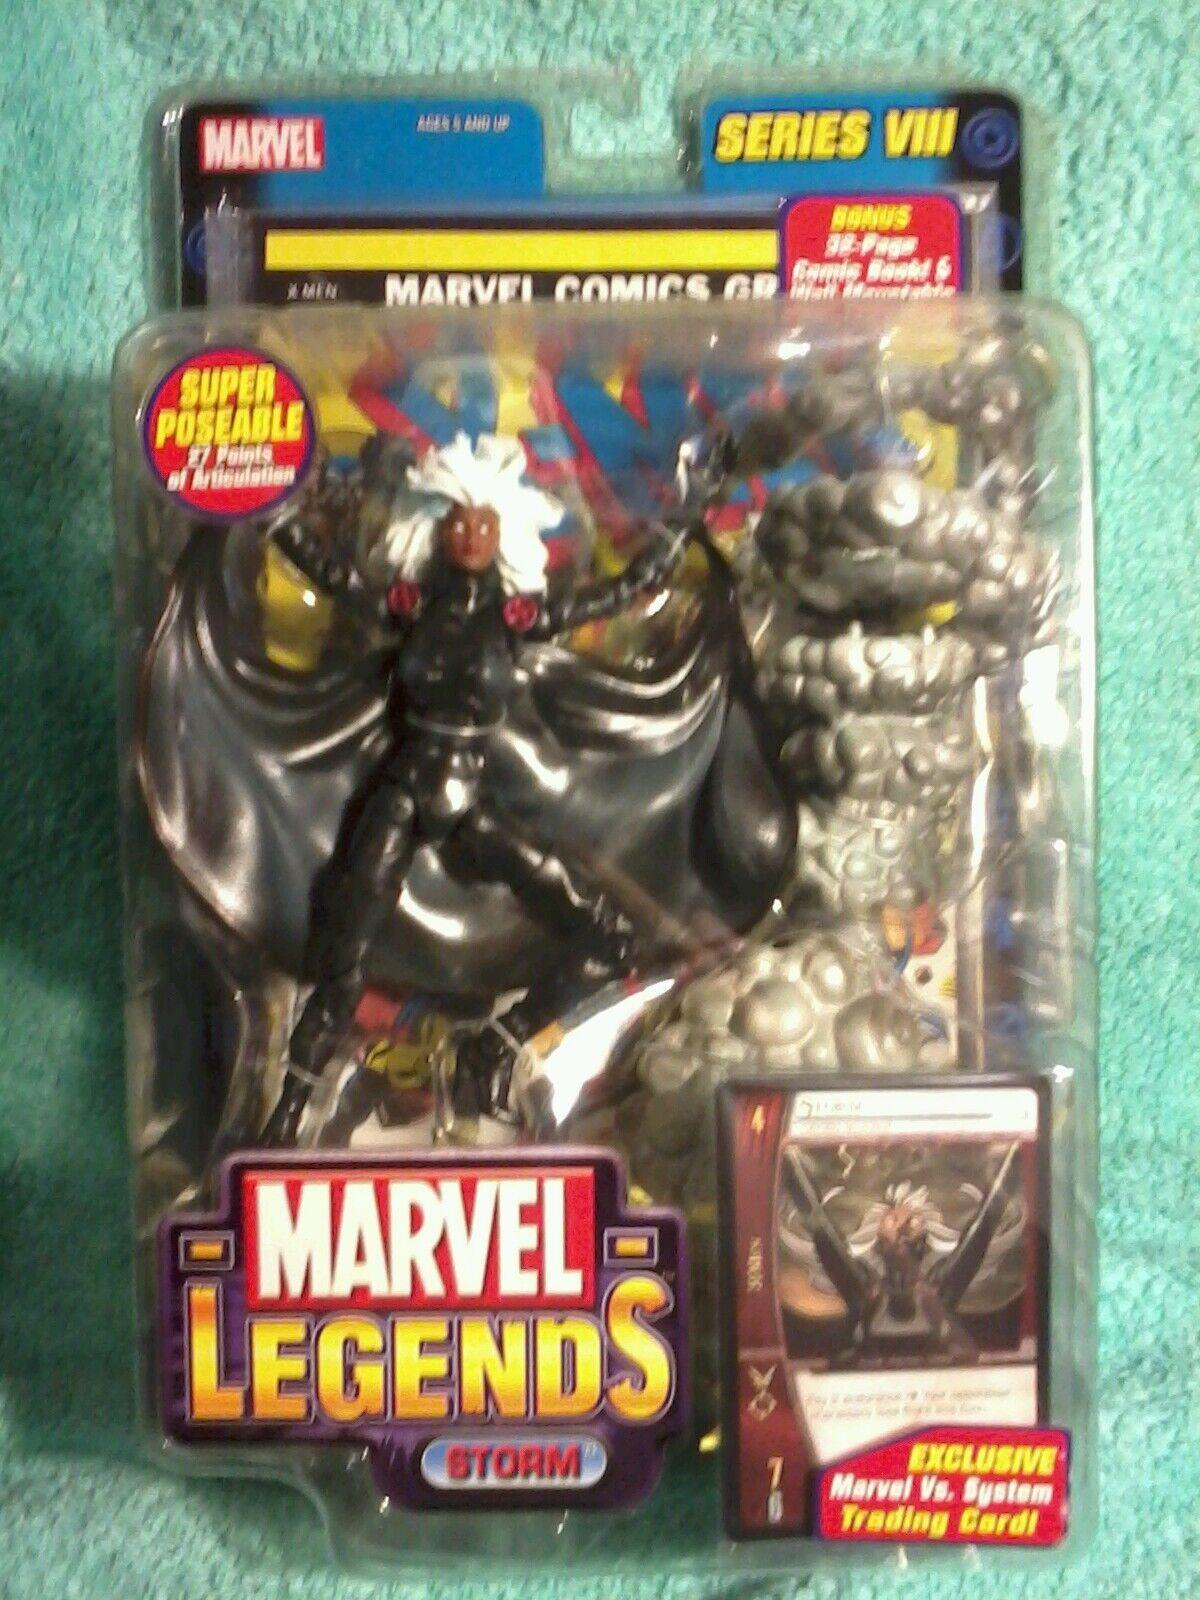 STORM Marvel Legends seriesVIII 6  Figure